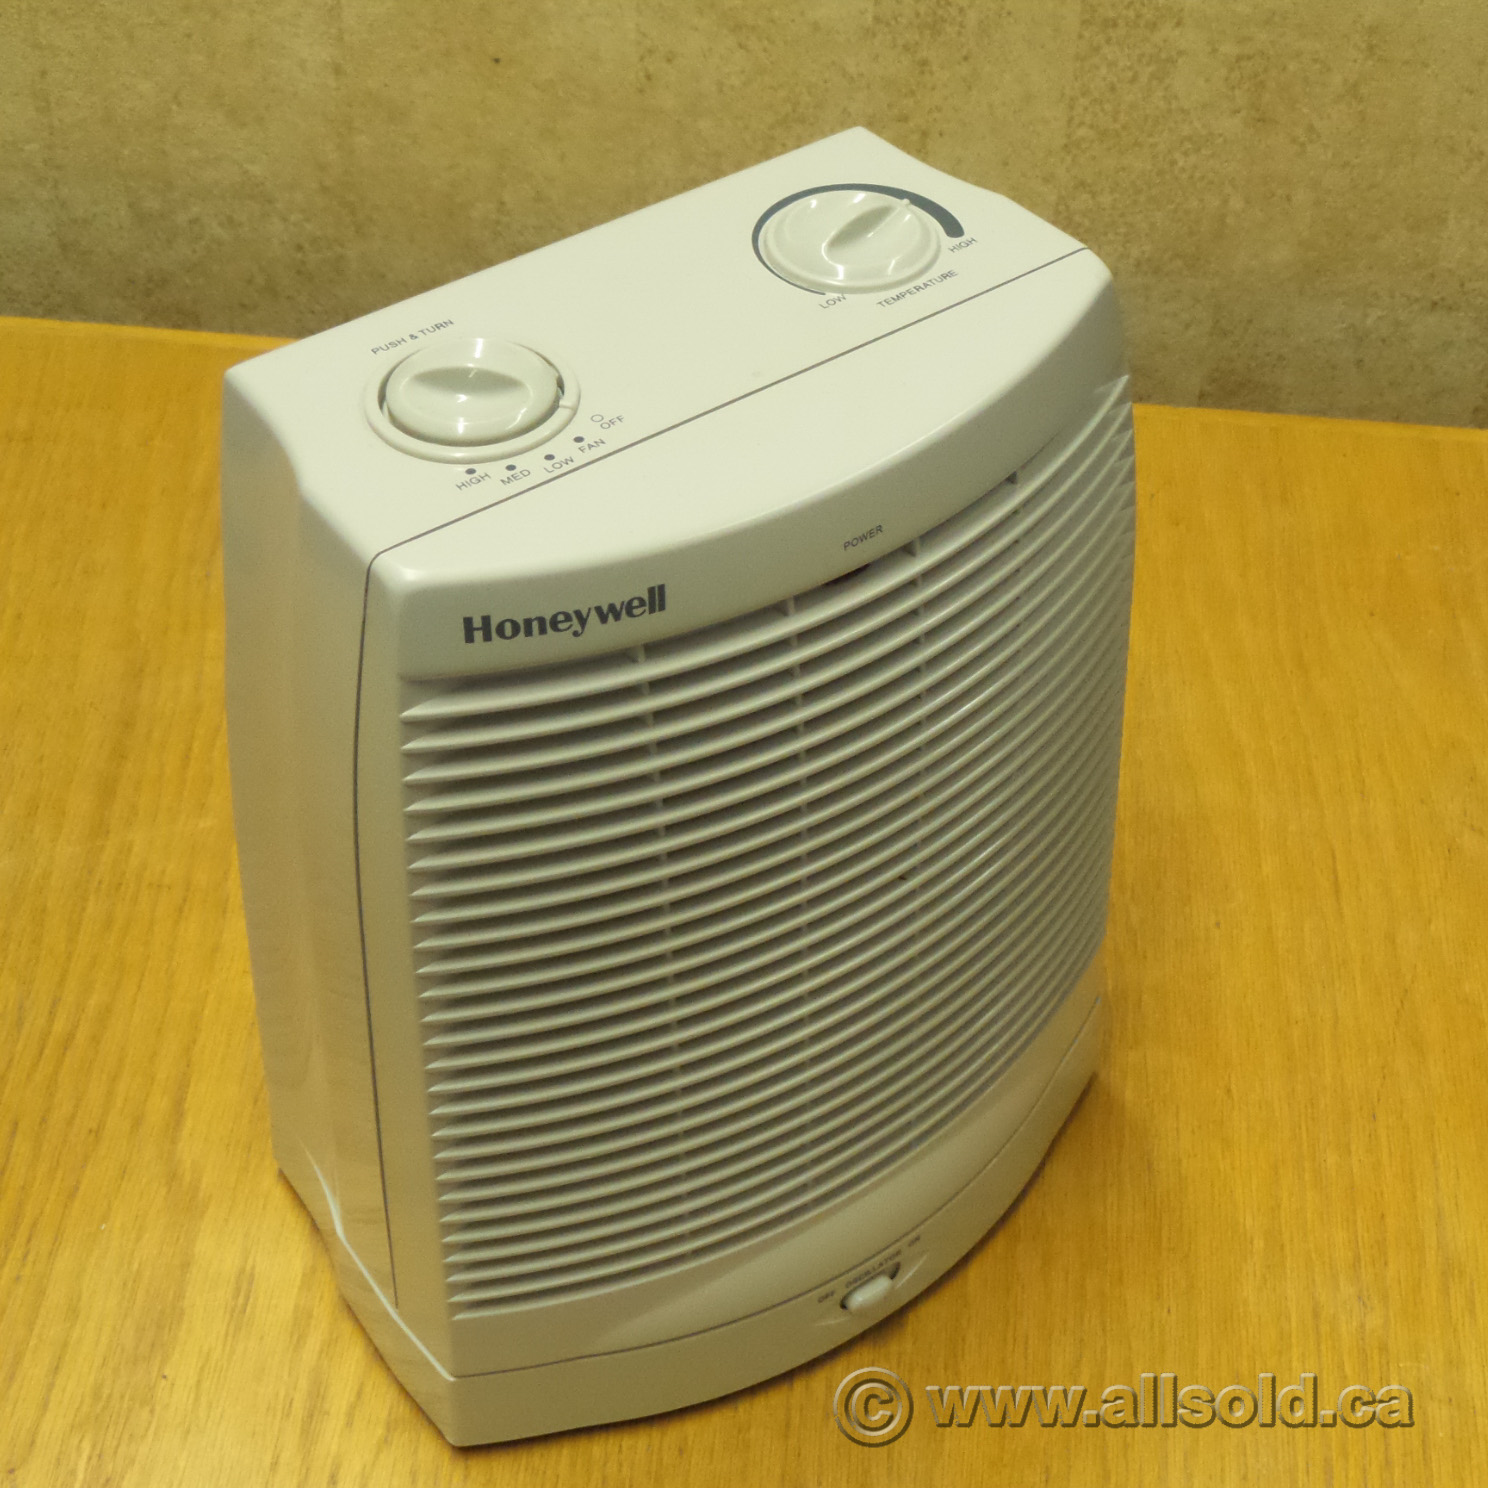 Honeywell Hz2300 1500w Oscillating Fan Space Heater